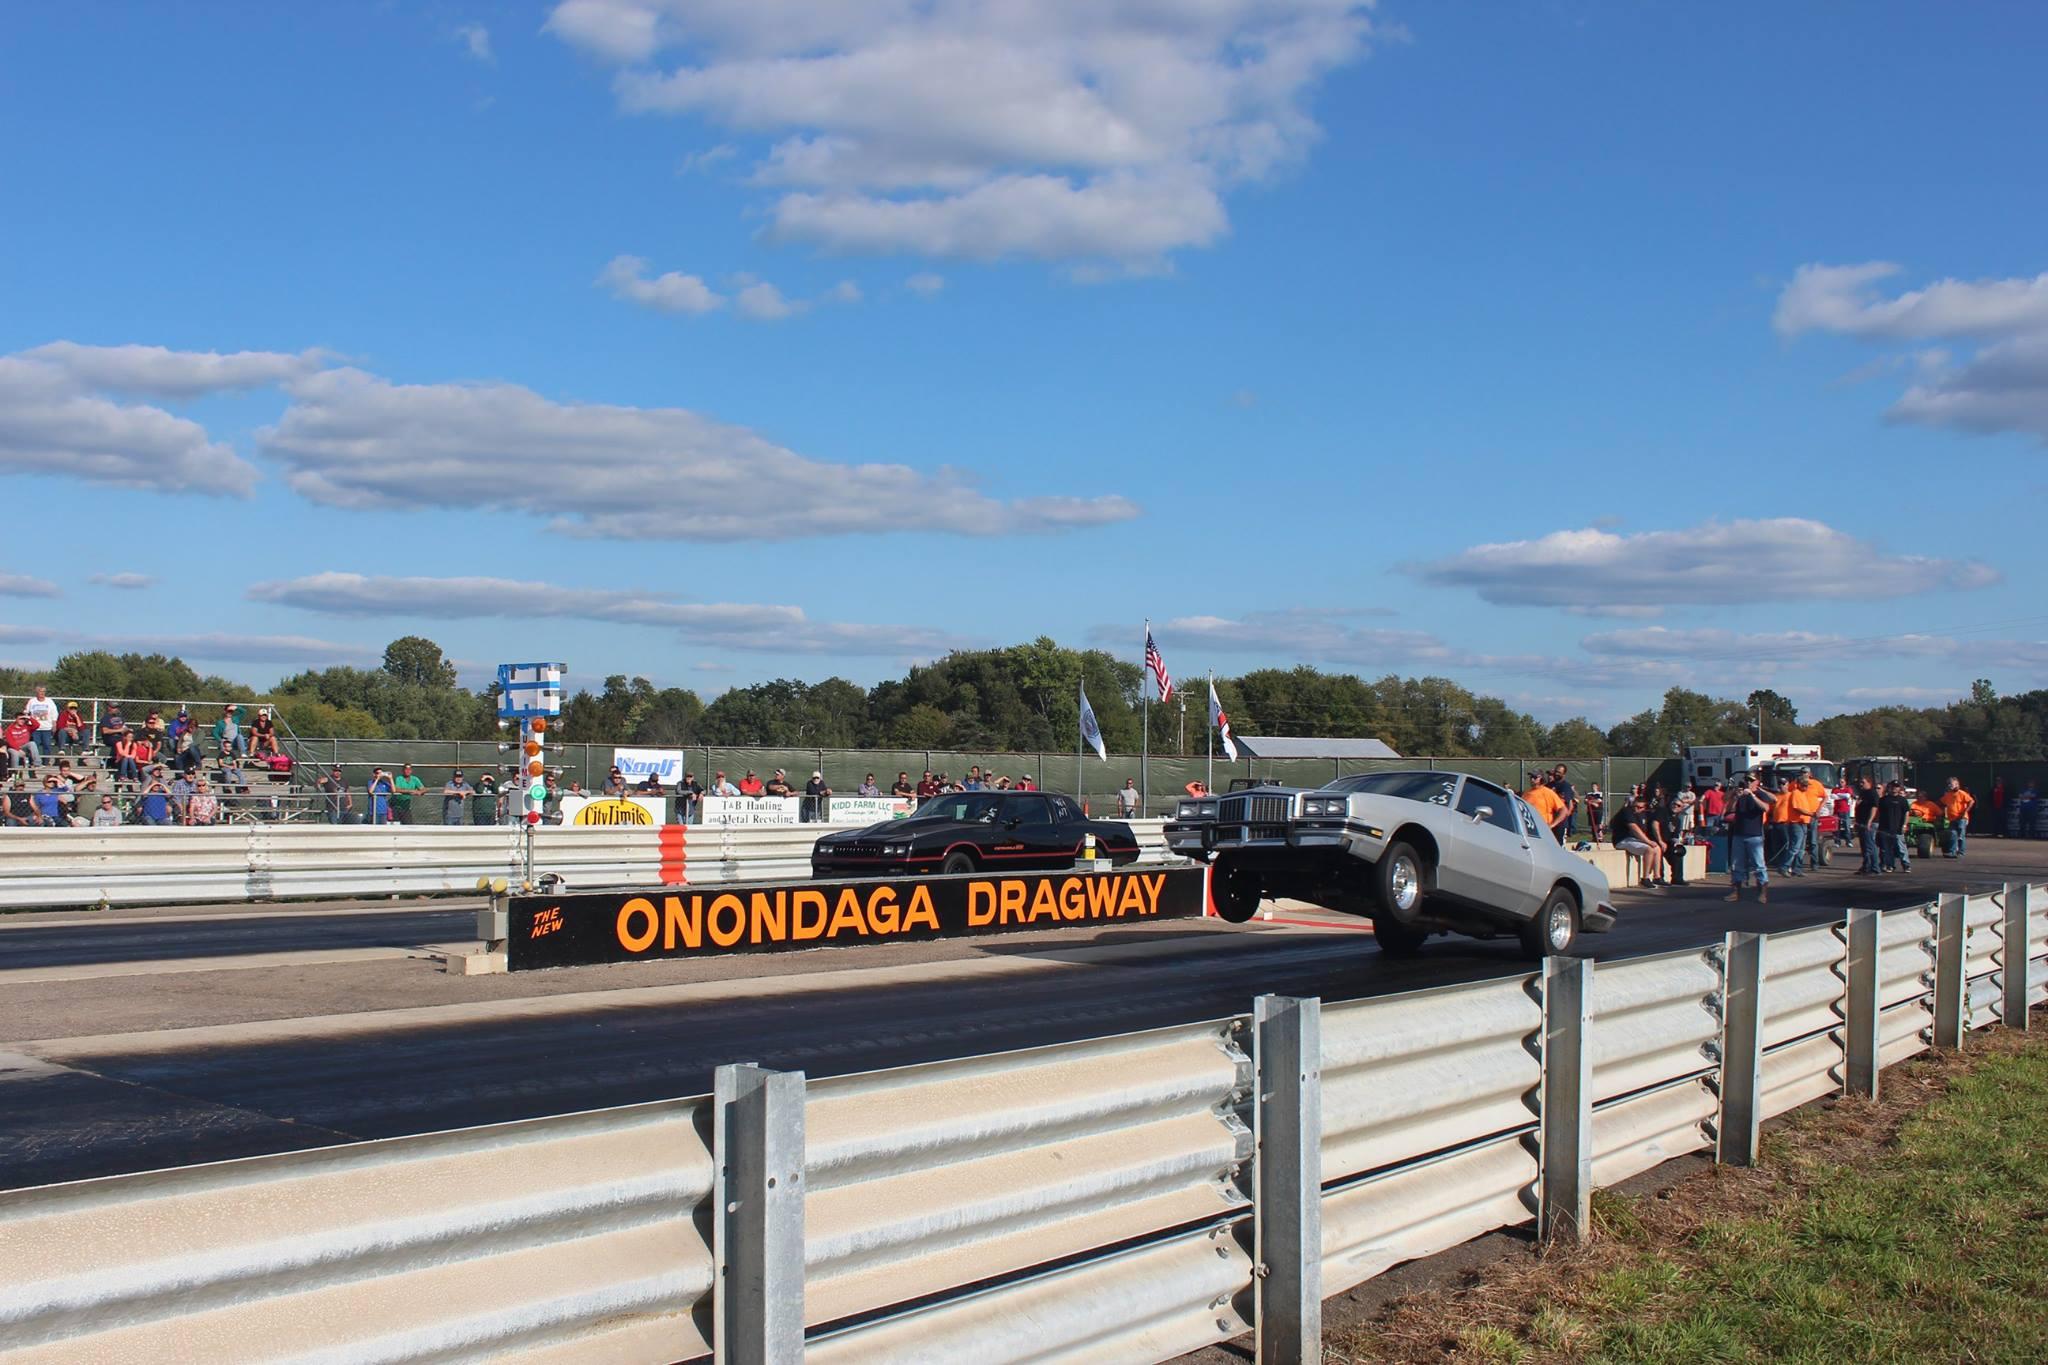 Onondaga Dragway wheelie